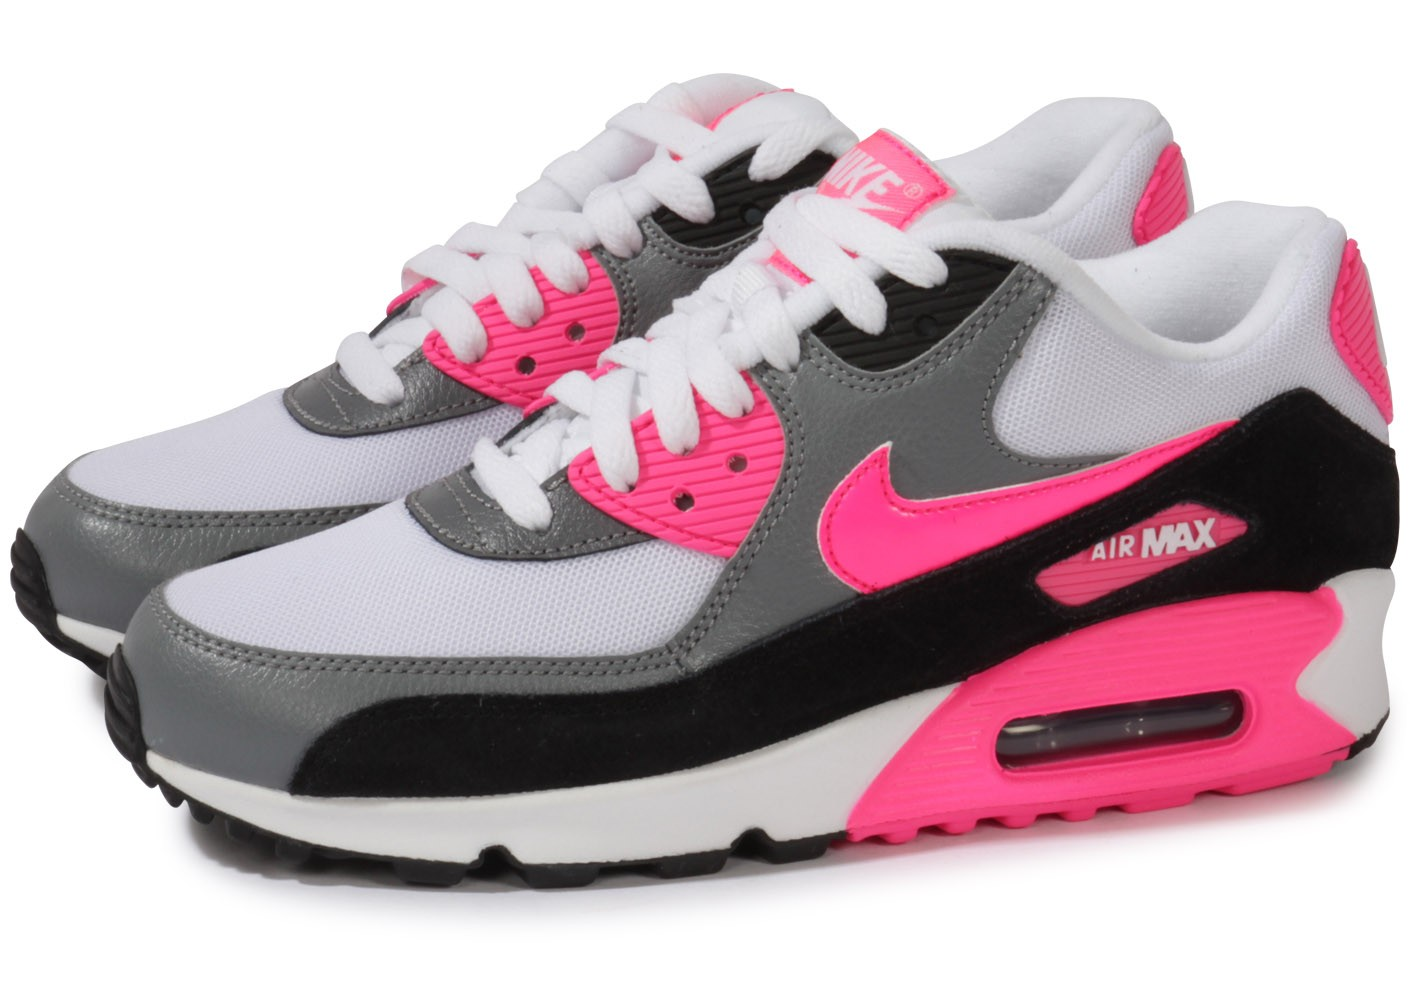 Nike Air Max 90 Femme Noir Et Rose